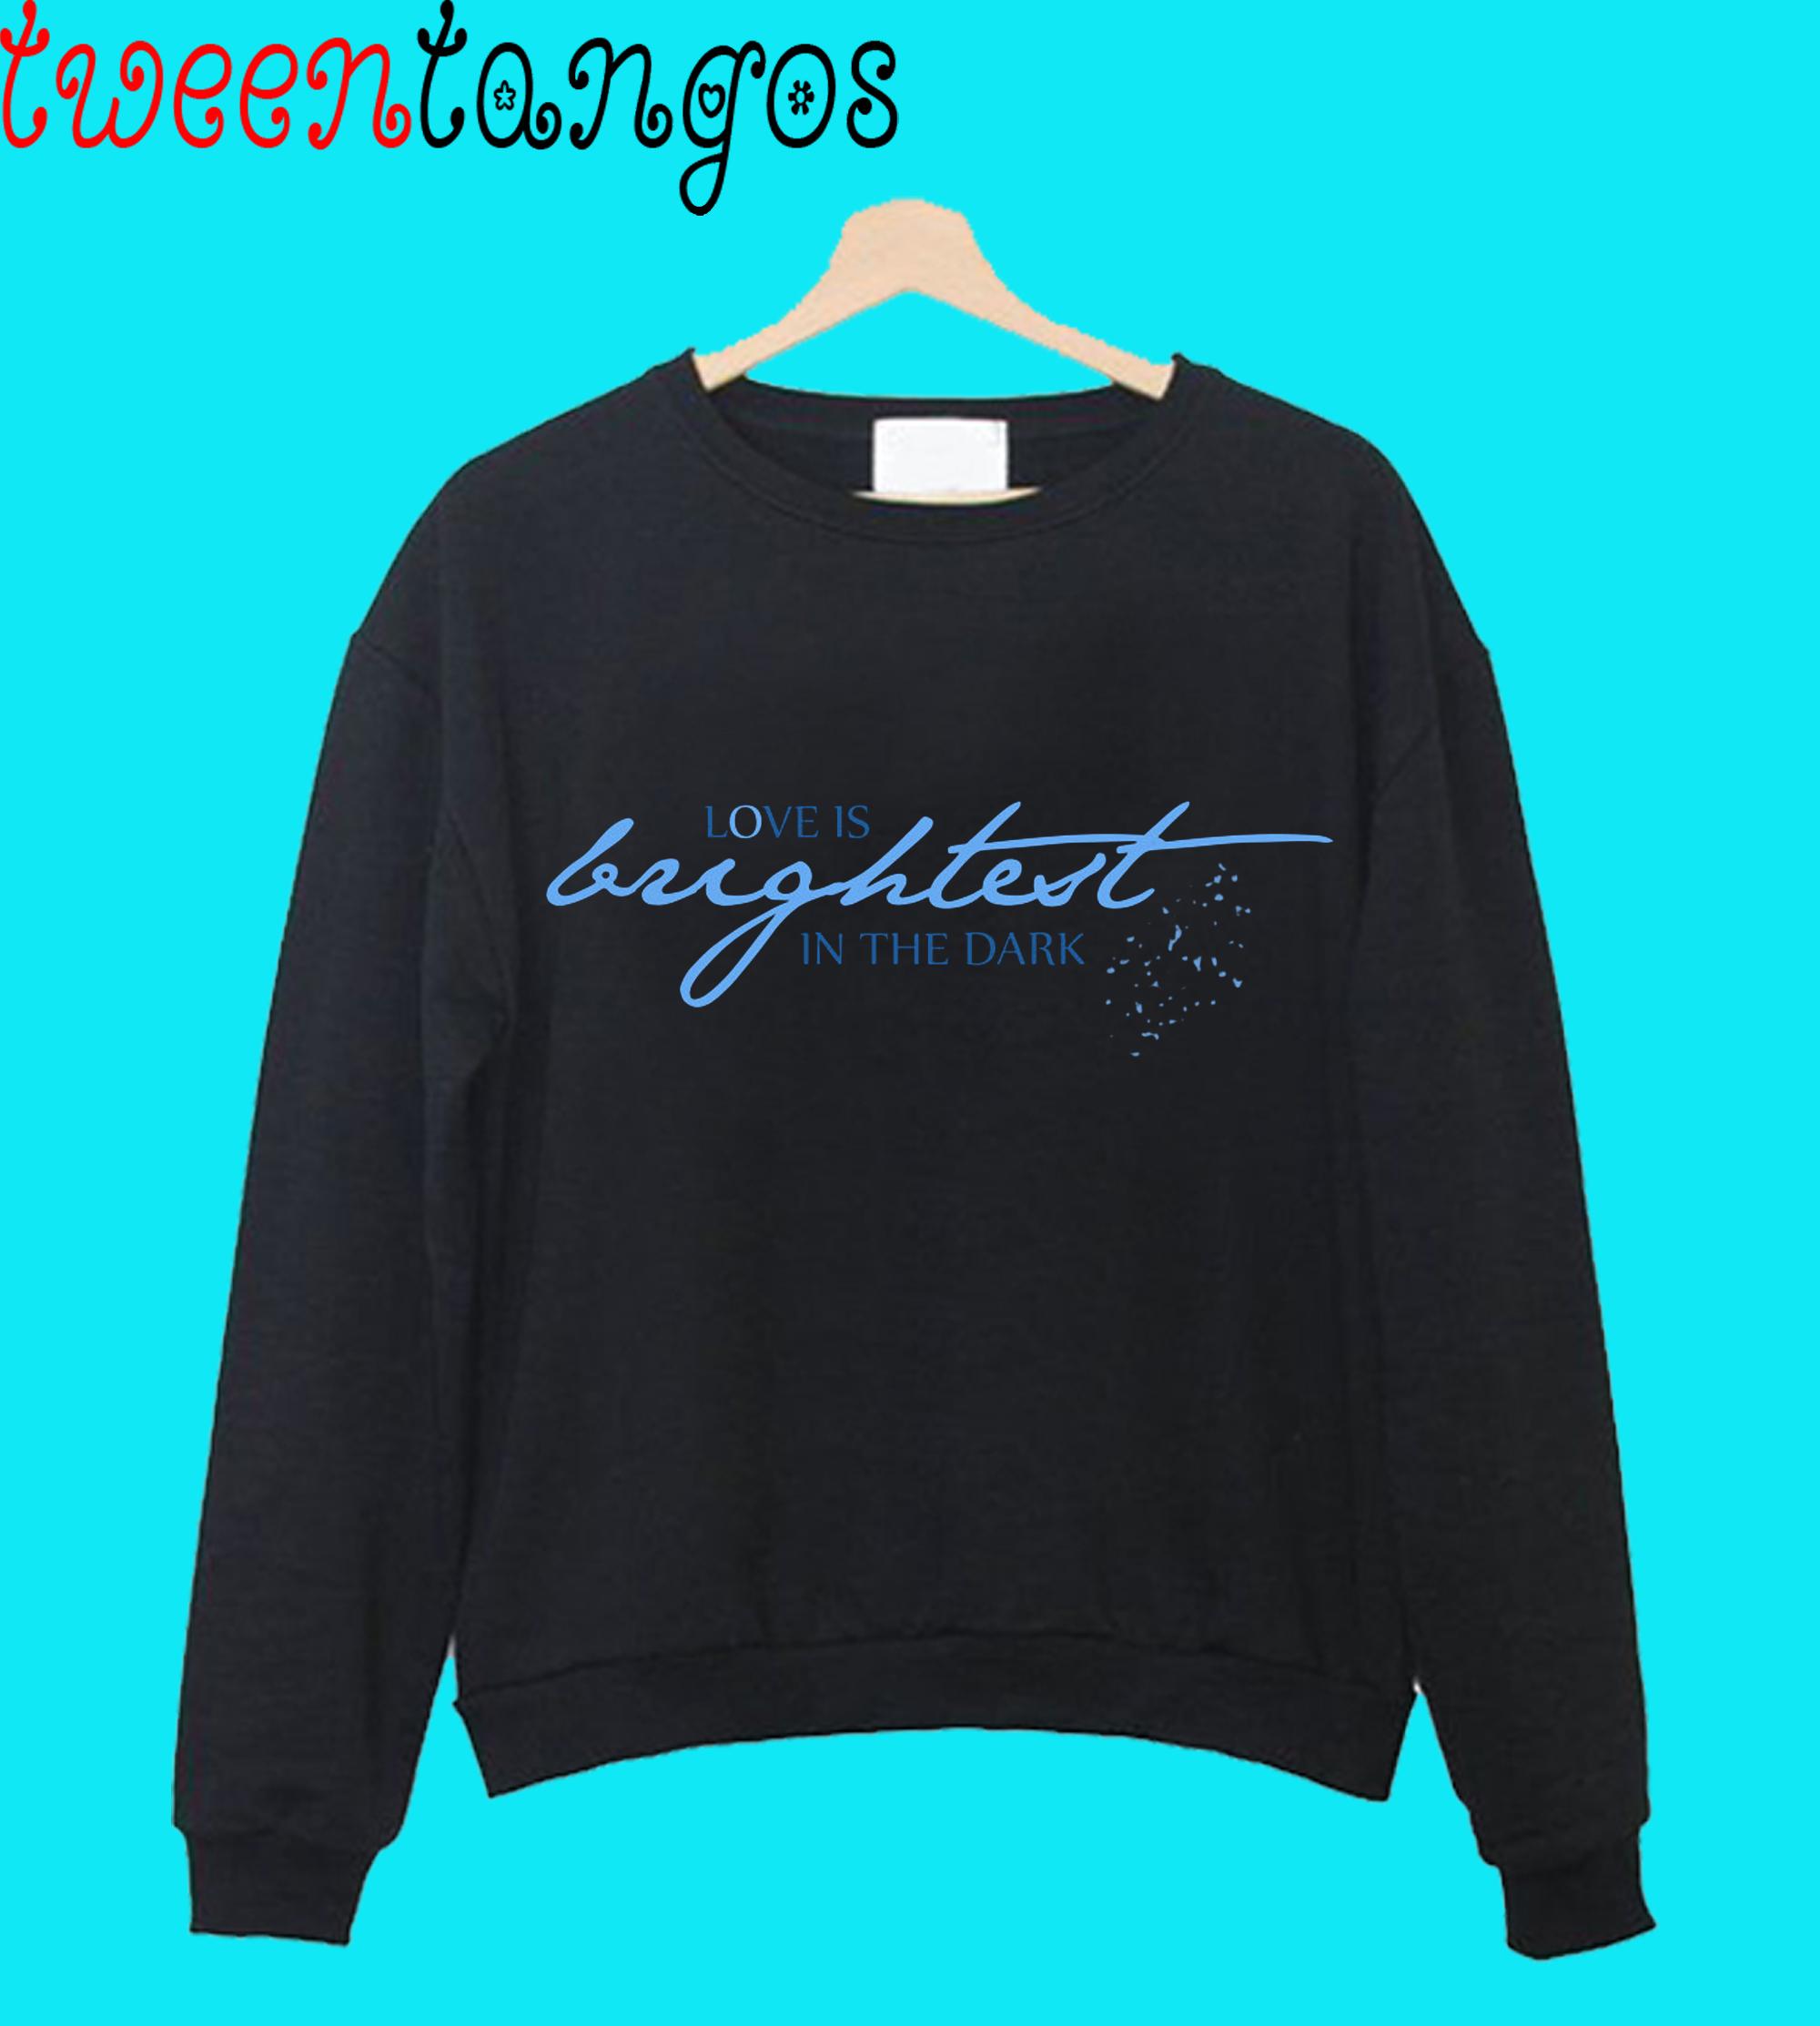 Love Is Brightest Crewneck Sweatshirt